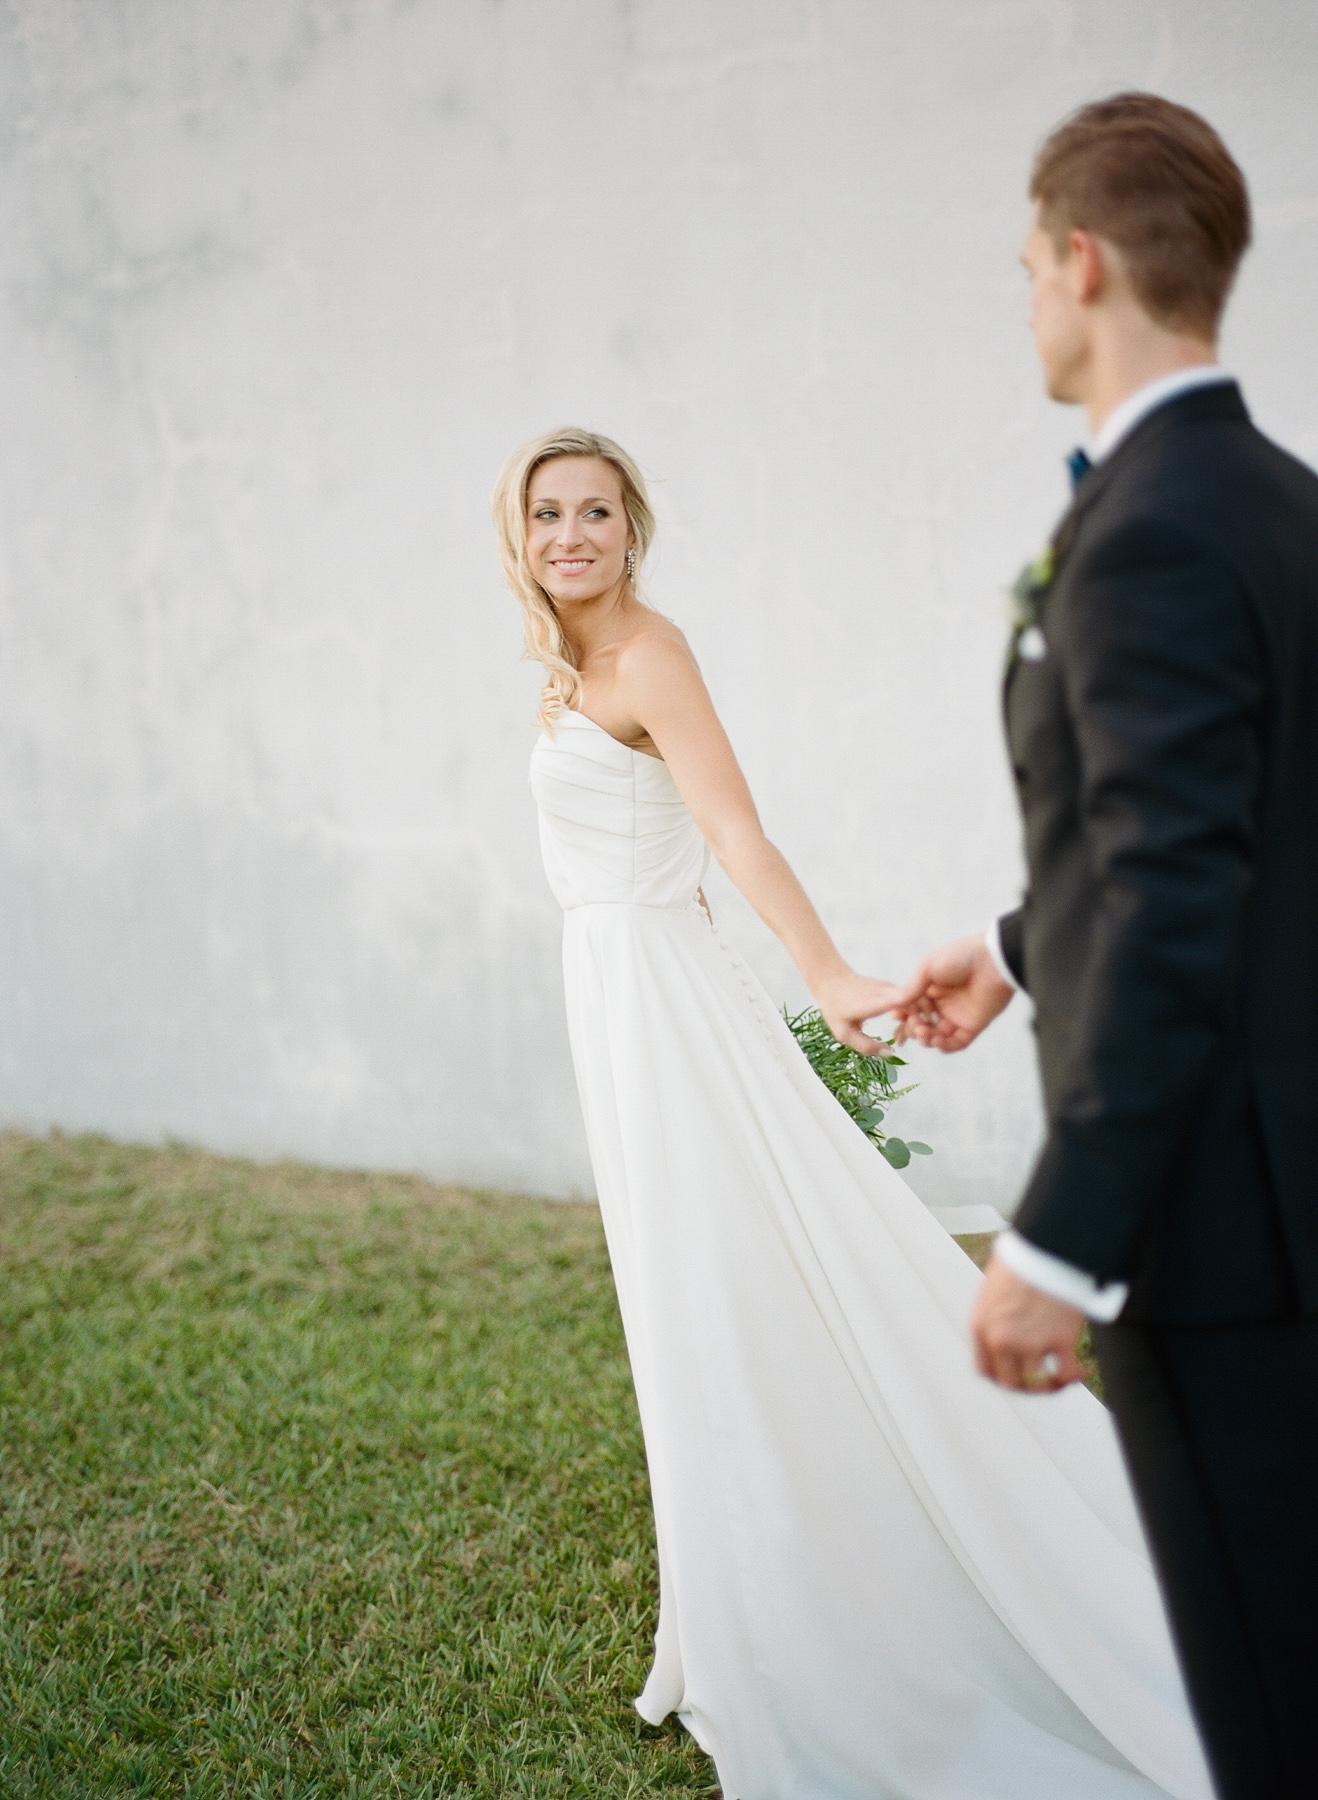 NC-wedding-venues-film-photographer-35.jpg